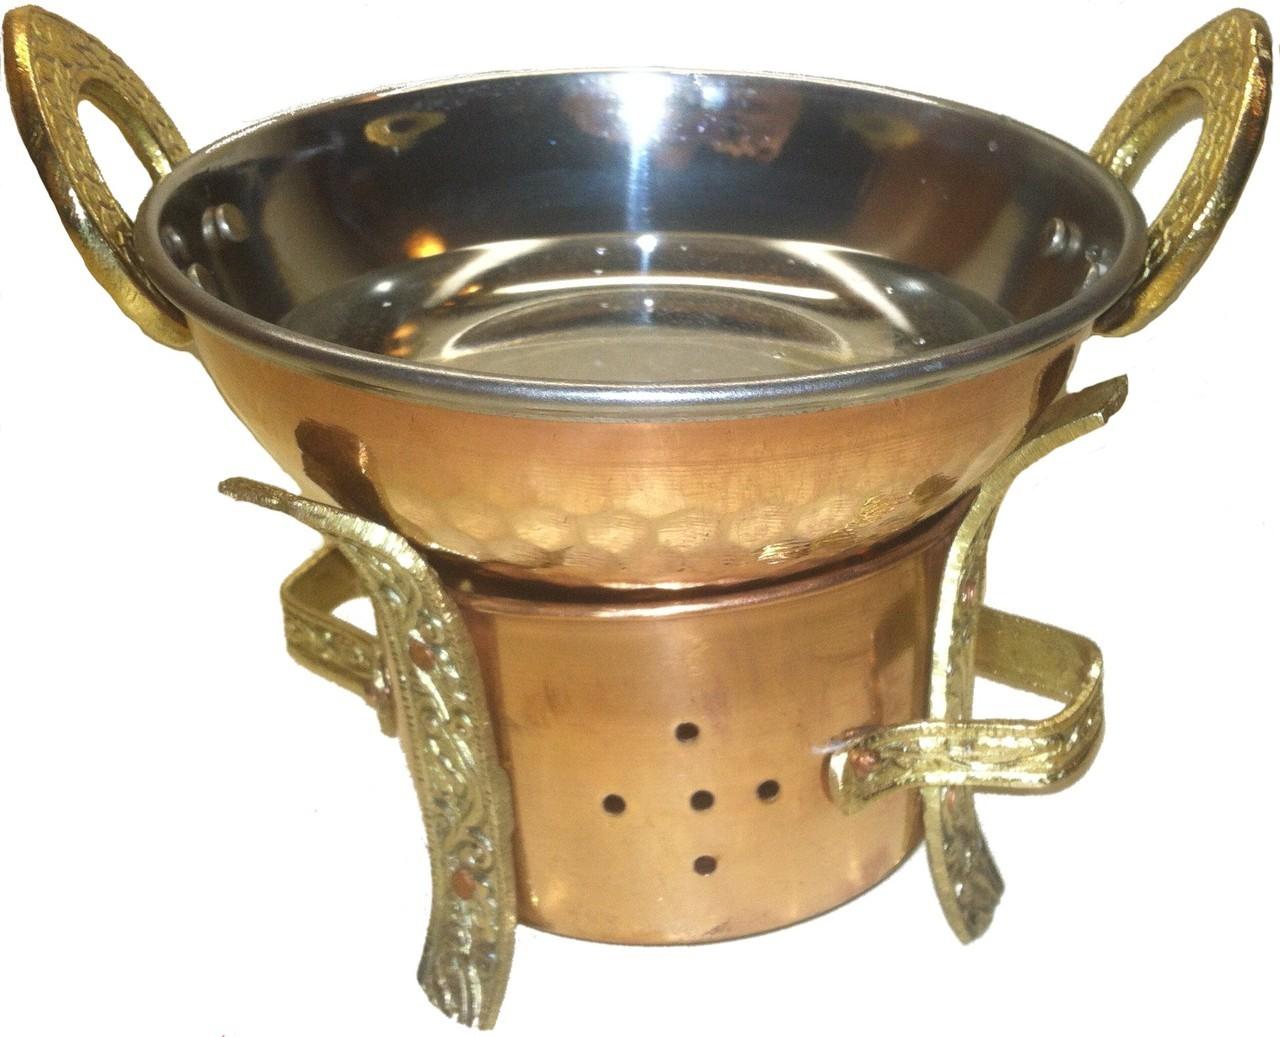 Traditional Massage Oil Warmer Shirodhara Equipment 9504